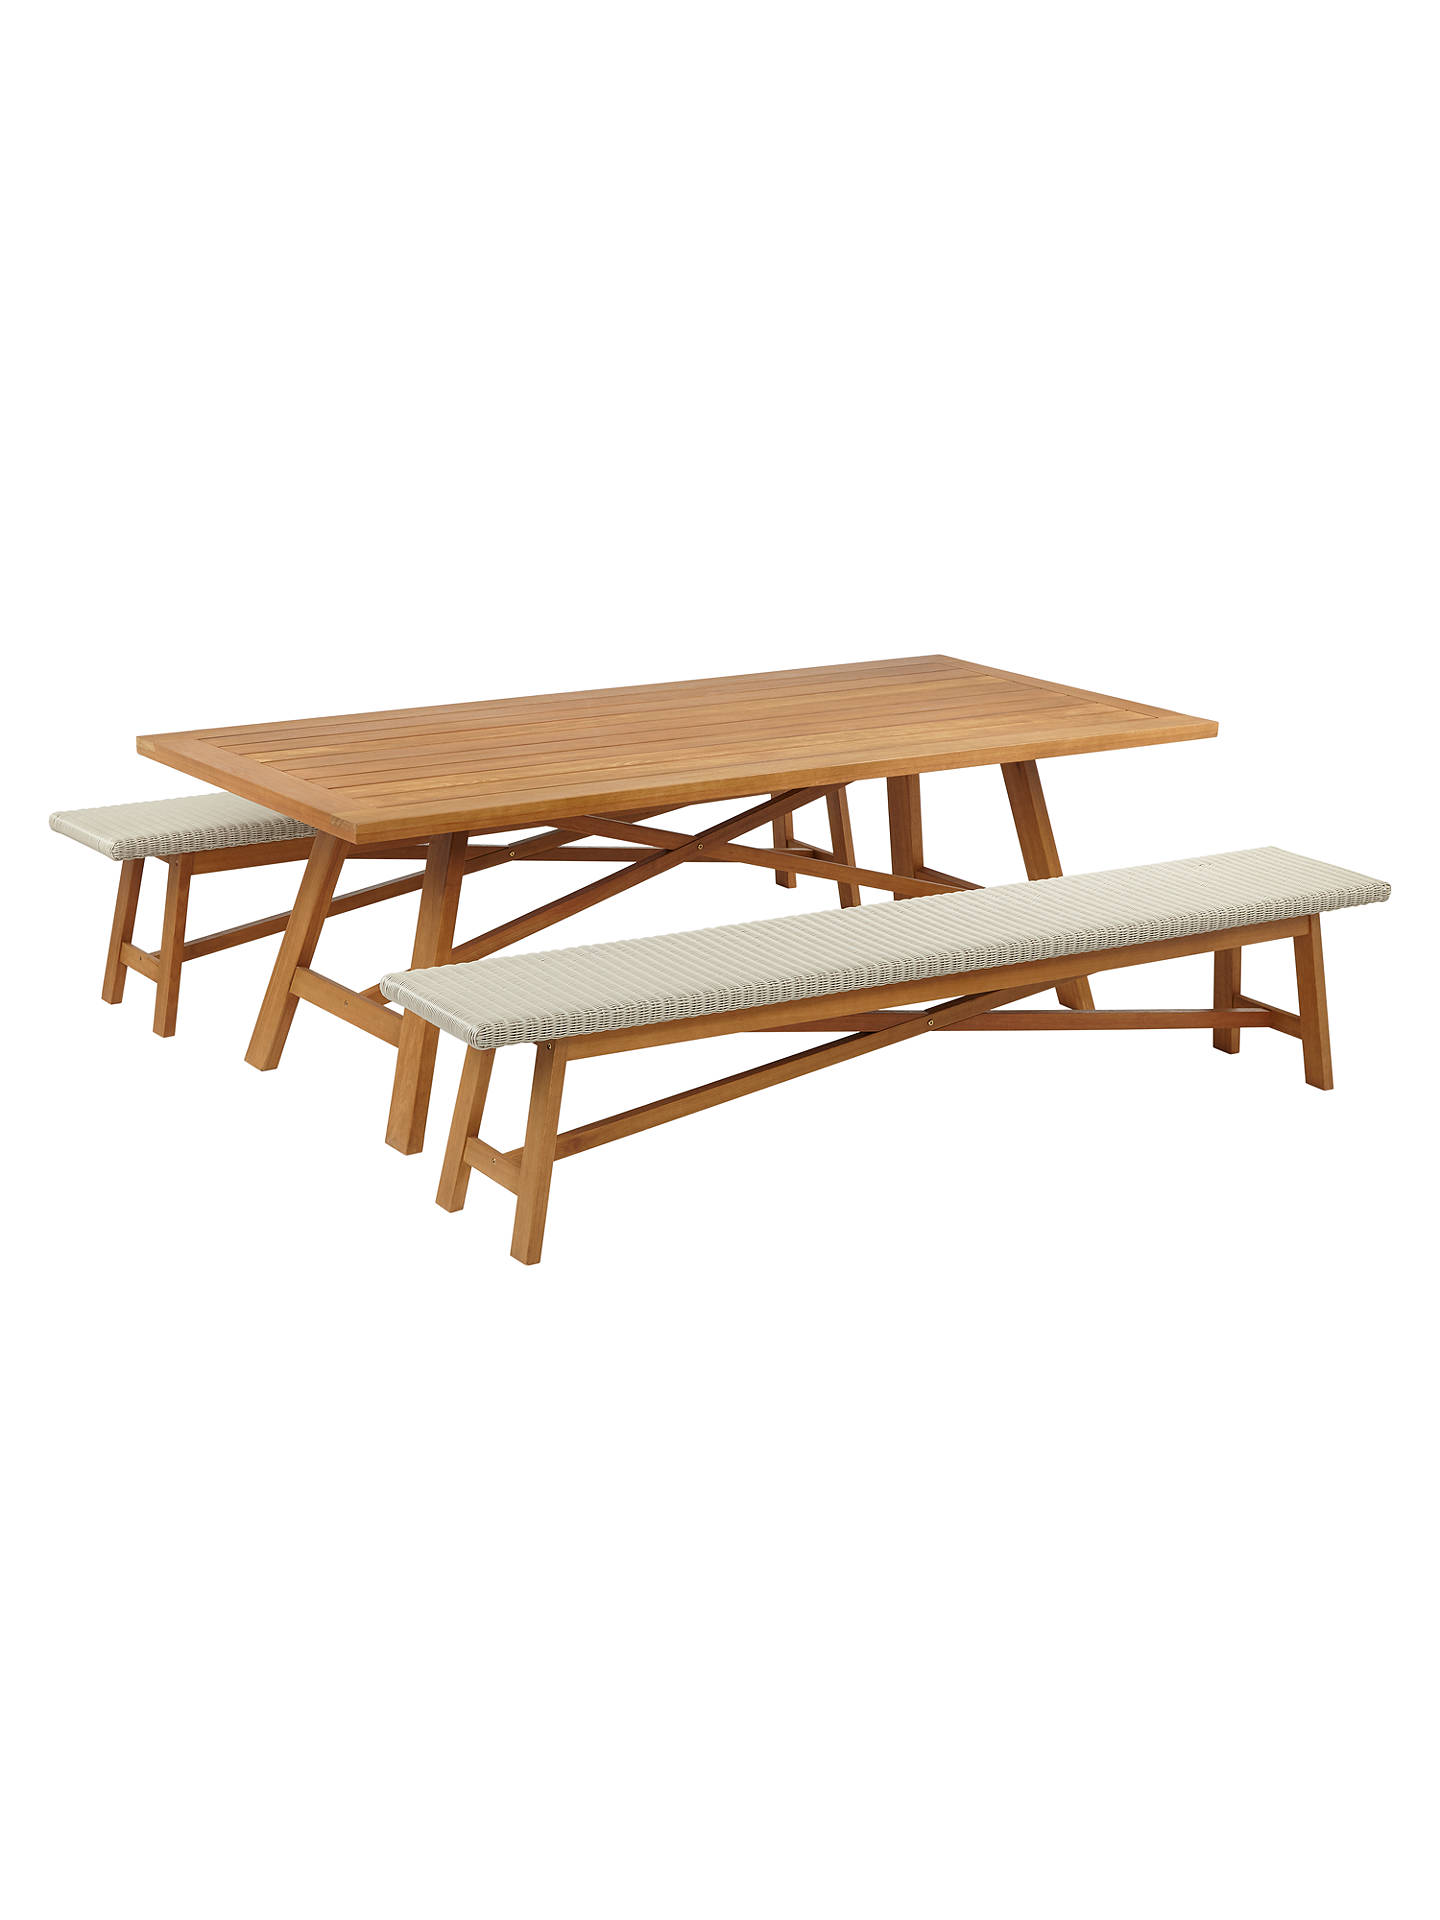 John Lewis Partners Stockholm 8 10 Seater Garden Dining Table Bench Set